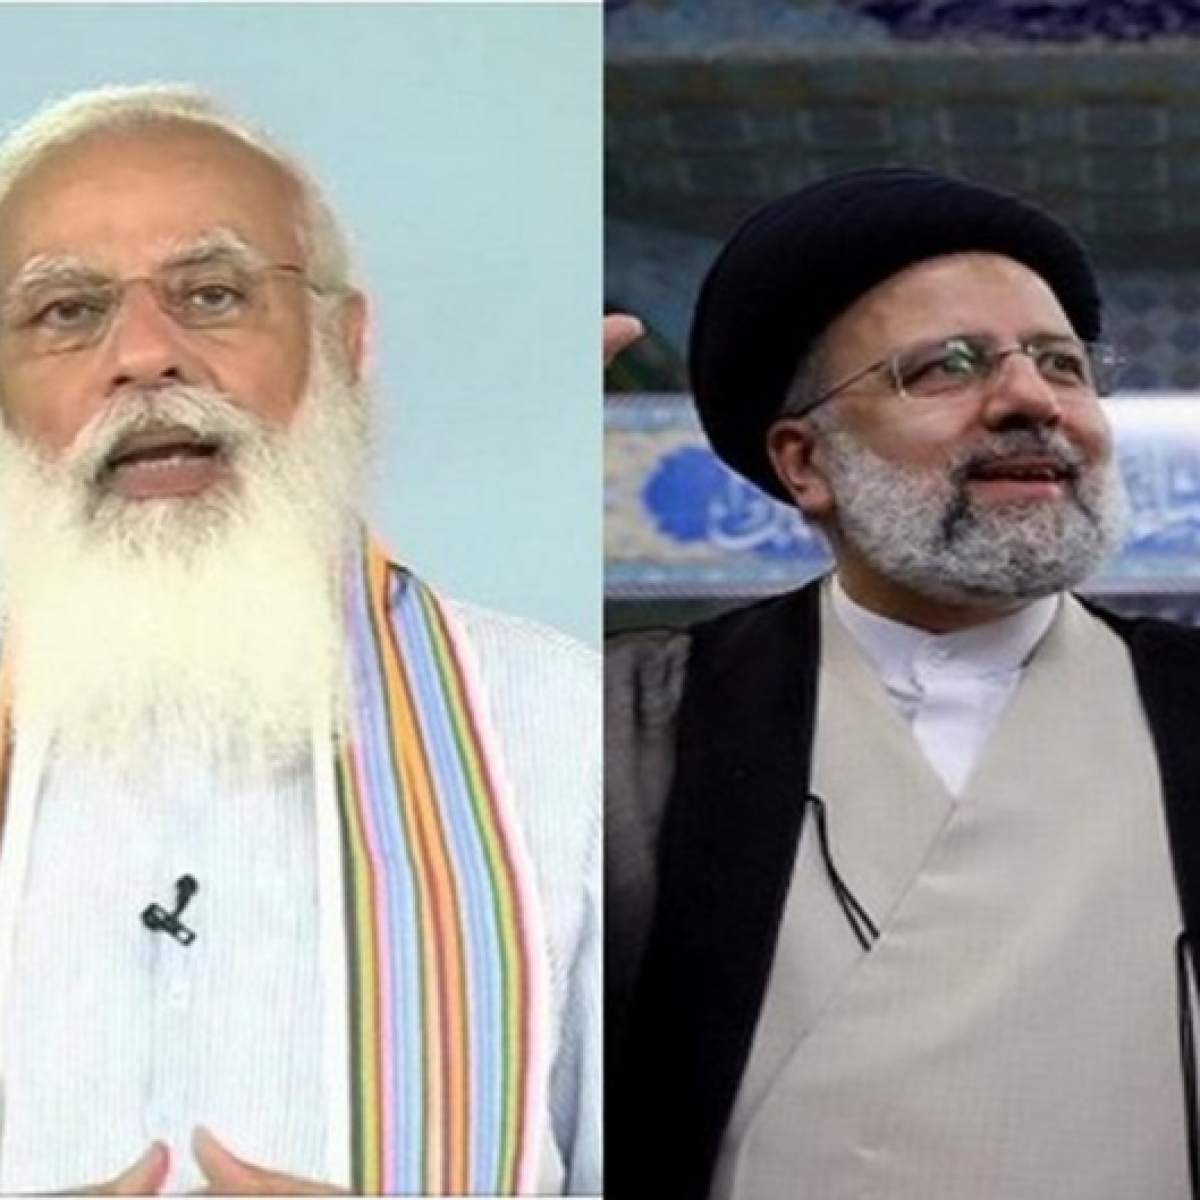 PM Modi congratulates Iran's President-elect Ebrahim Raisi, says looking forward to strengthen ties